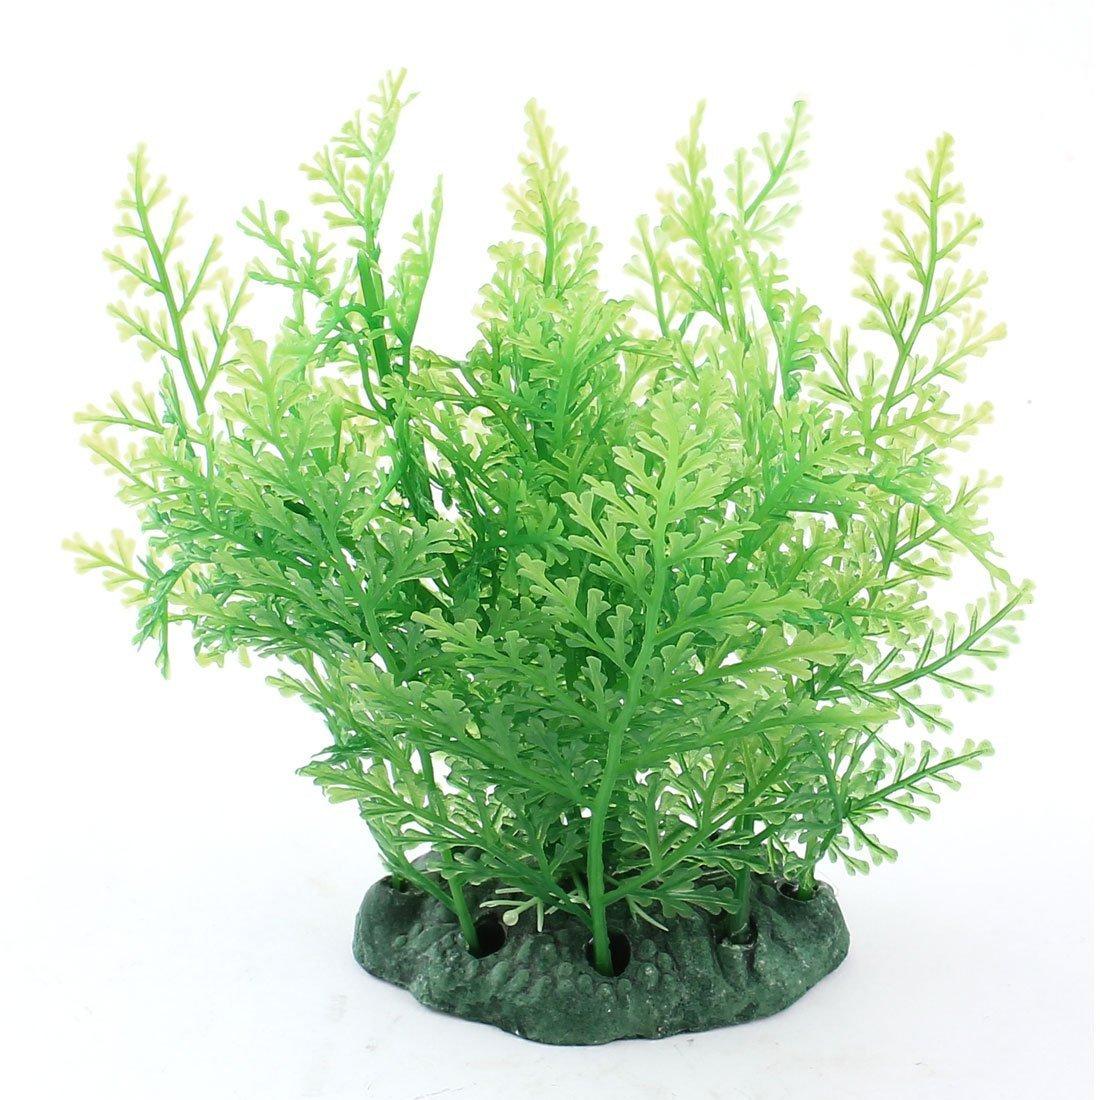 1Pc Water & Wood Fish Tank Aquascape Green Snowflake Shape Artificial Plant 4.9  High